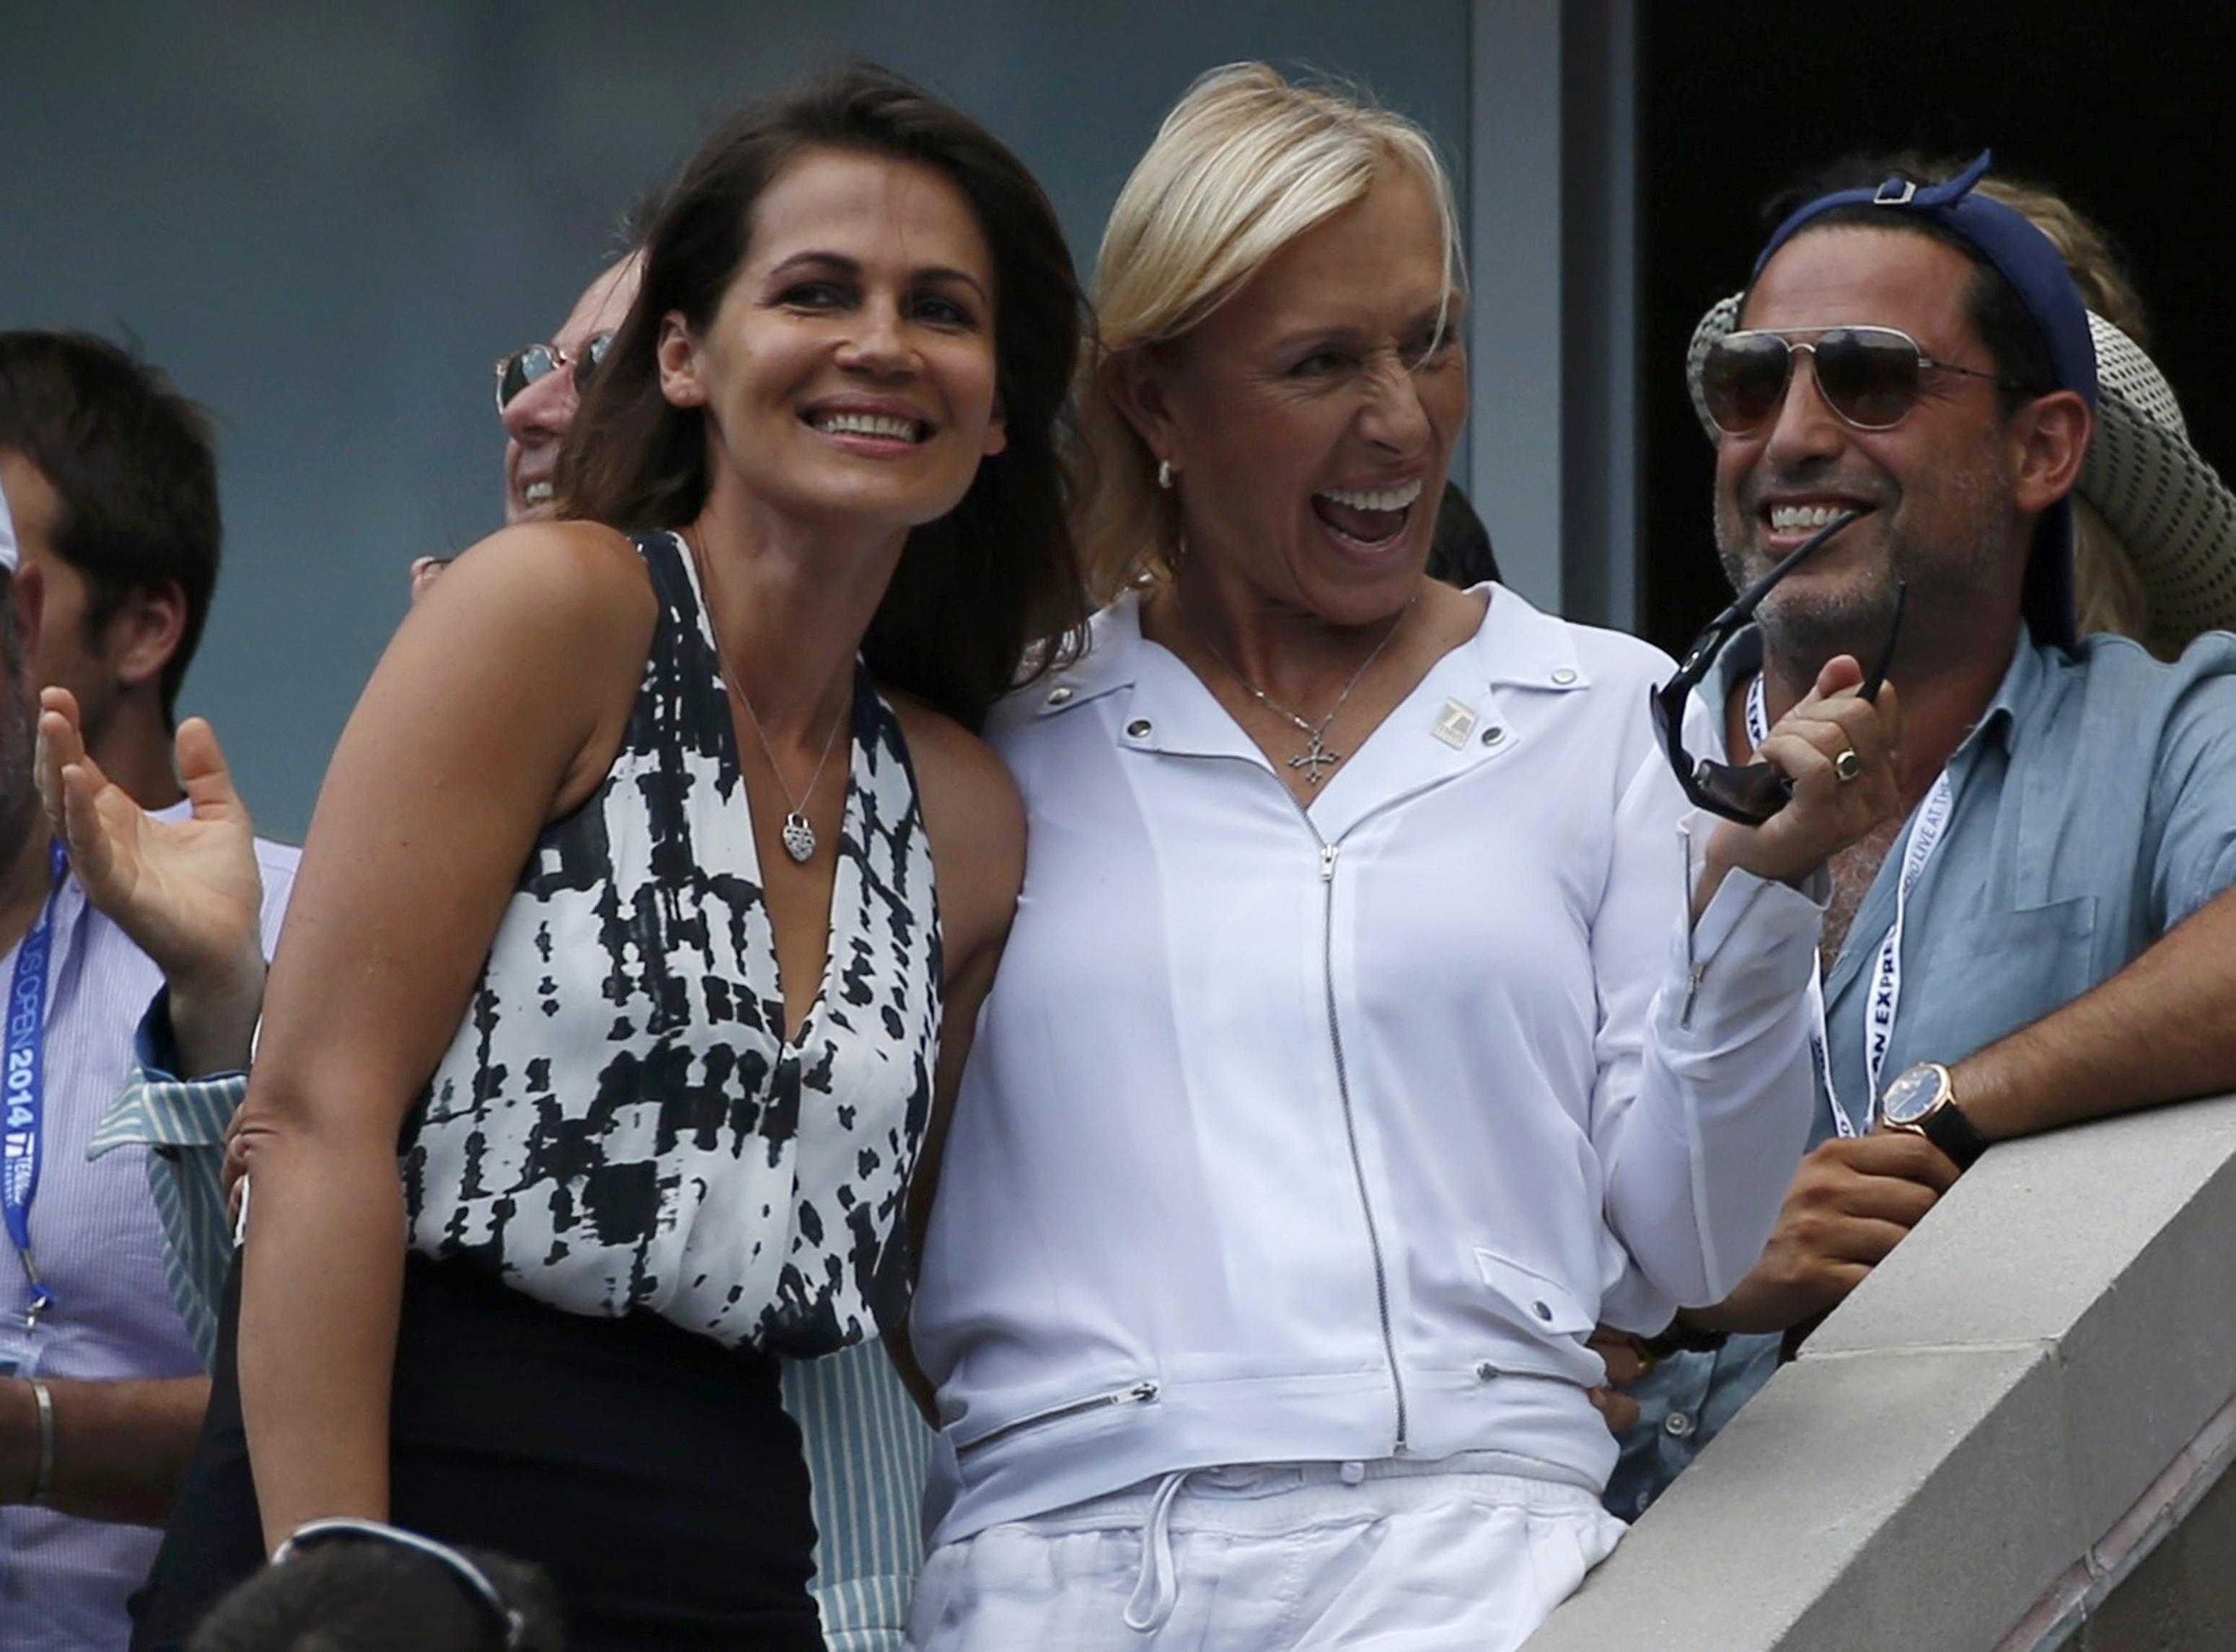 Amerika Açıkta evlenme teklifi! Navratilova - ABD Açık